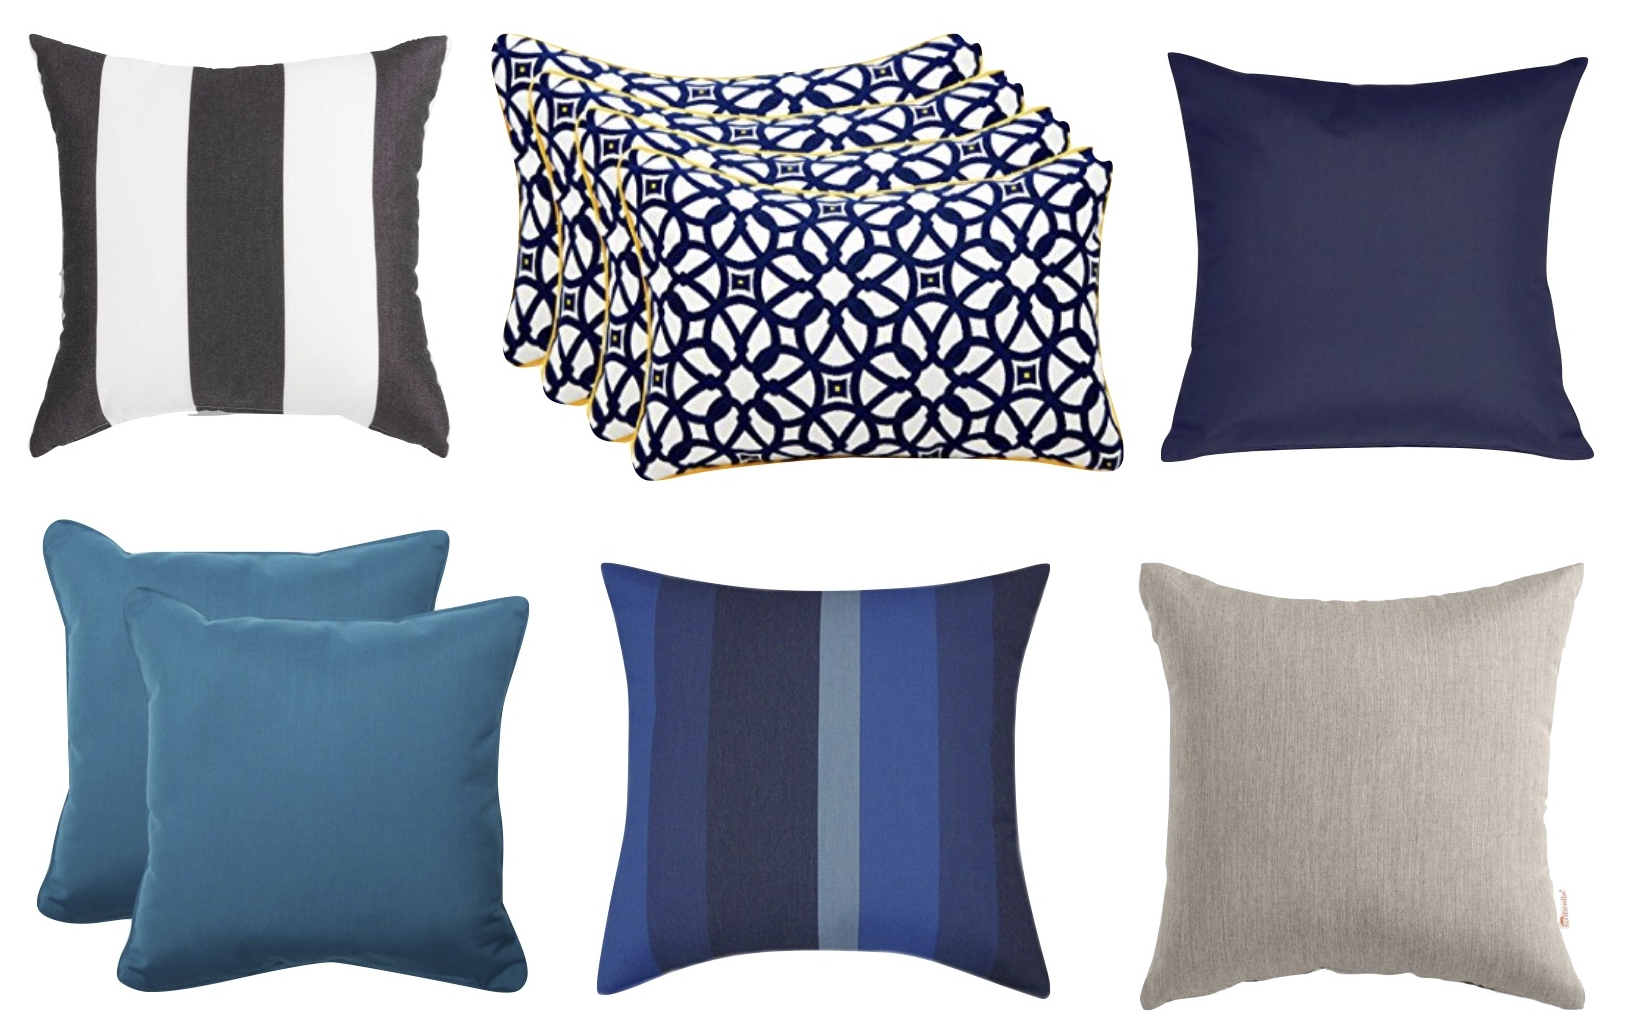 Outdoor Sunbrella Pillows Roundup.jpg